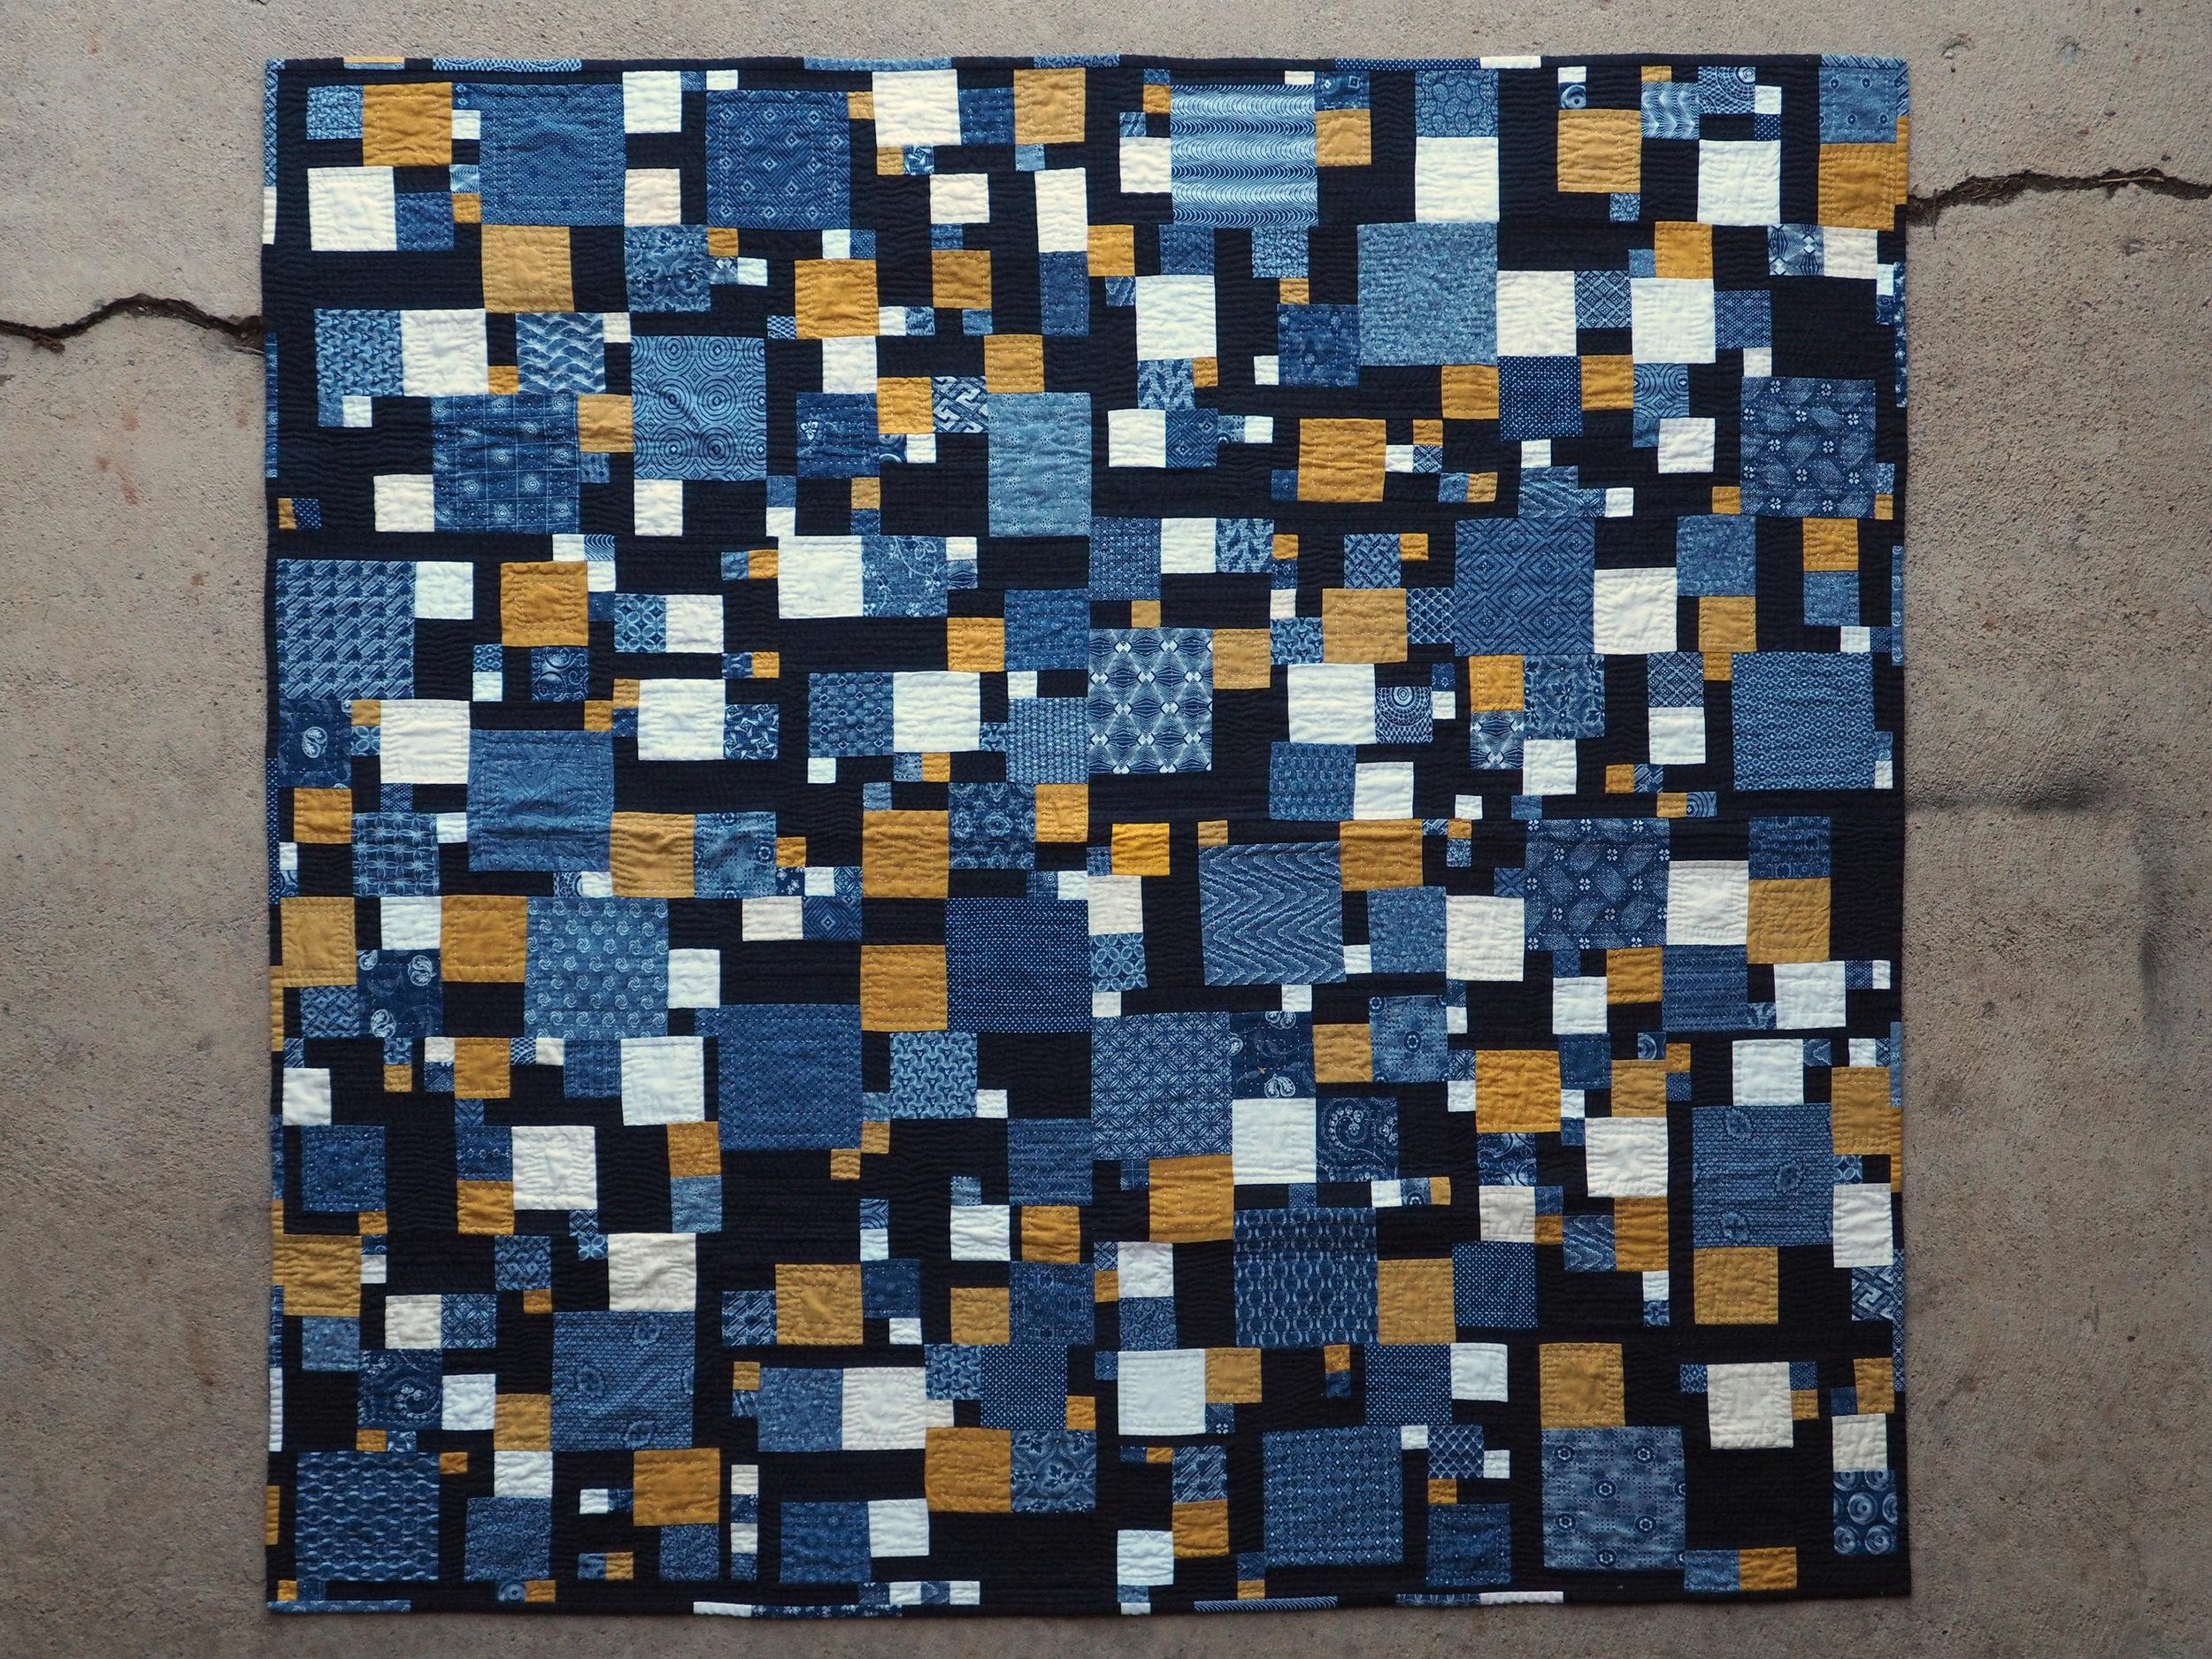 Quilt no. 017: Redux. 2016. Various cottons and cotton blends. 53.5″ x 55.